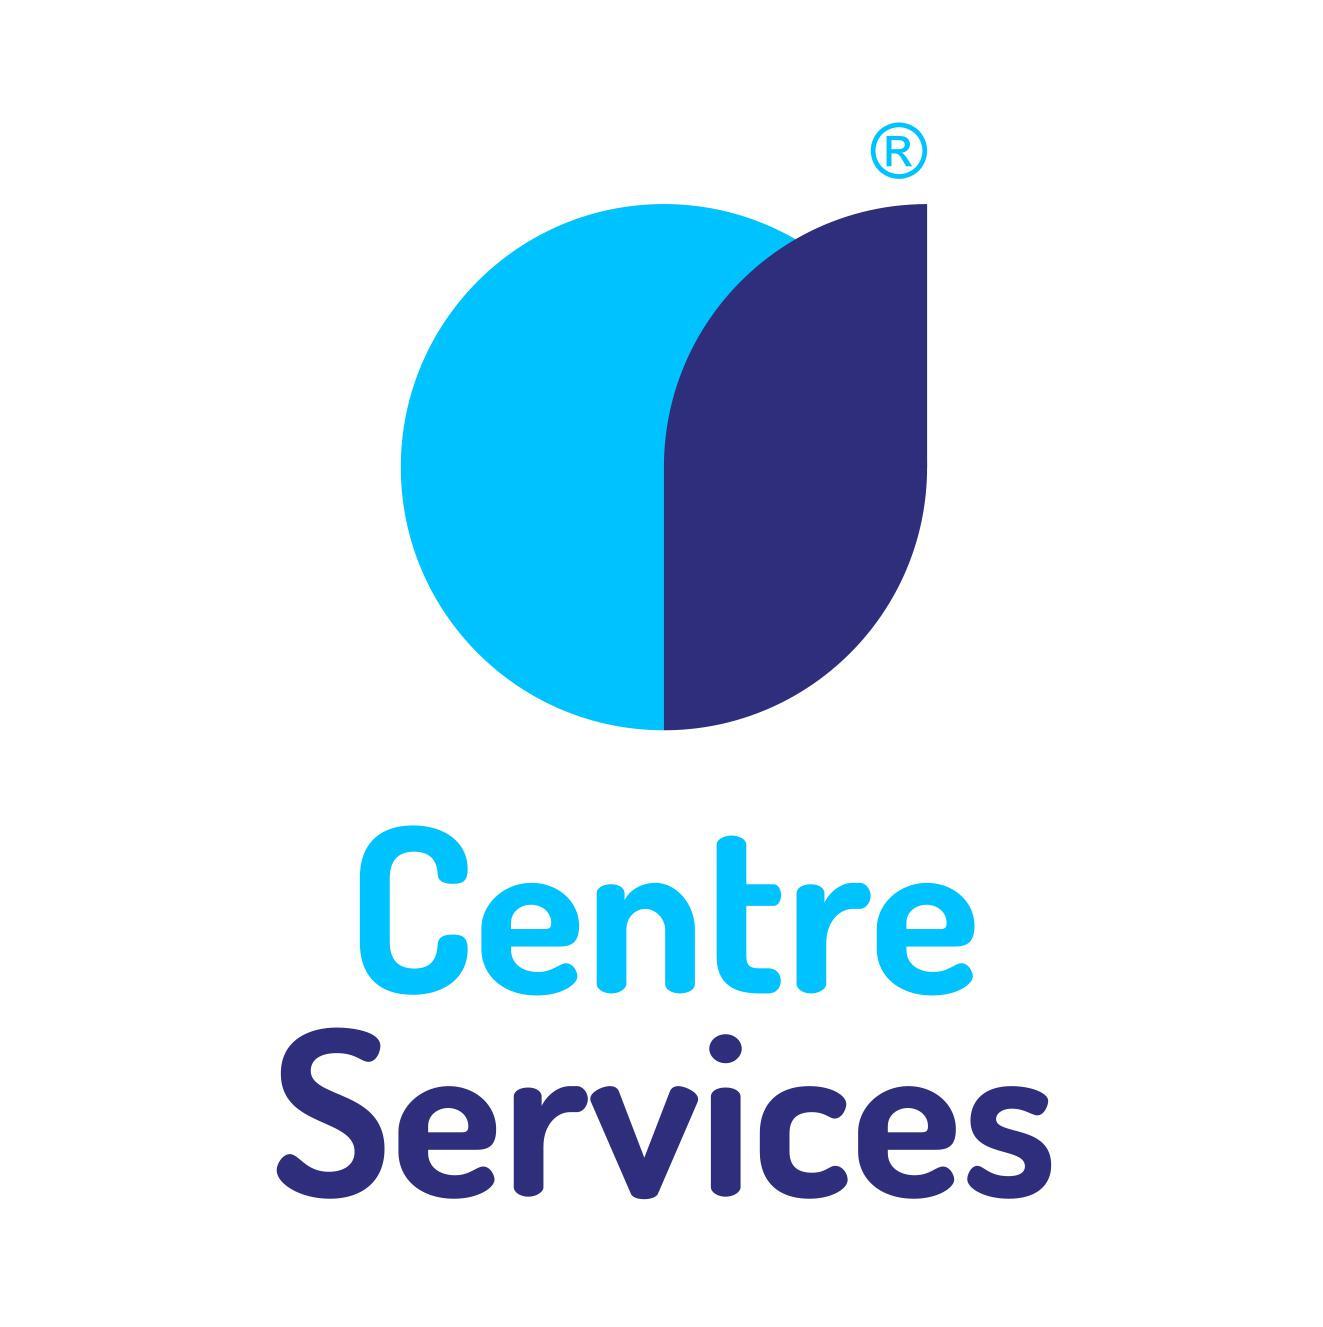 Centres services Lannion jardinier